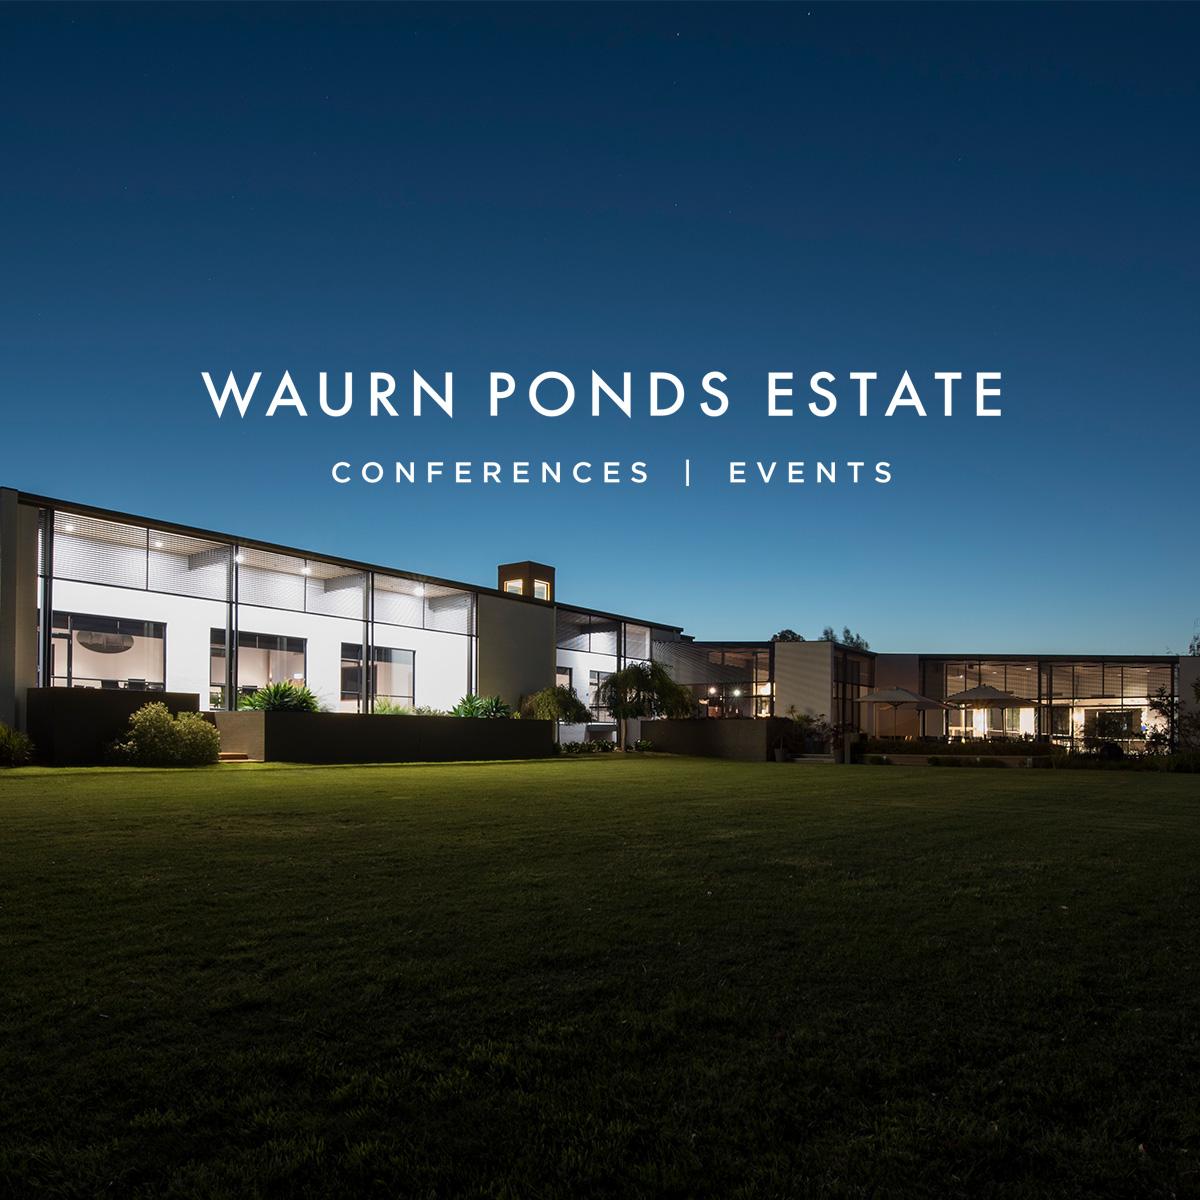 Waurn Ponds Estate